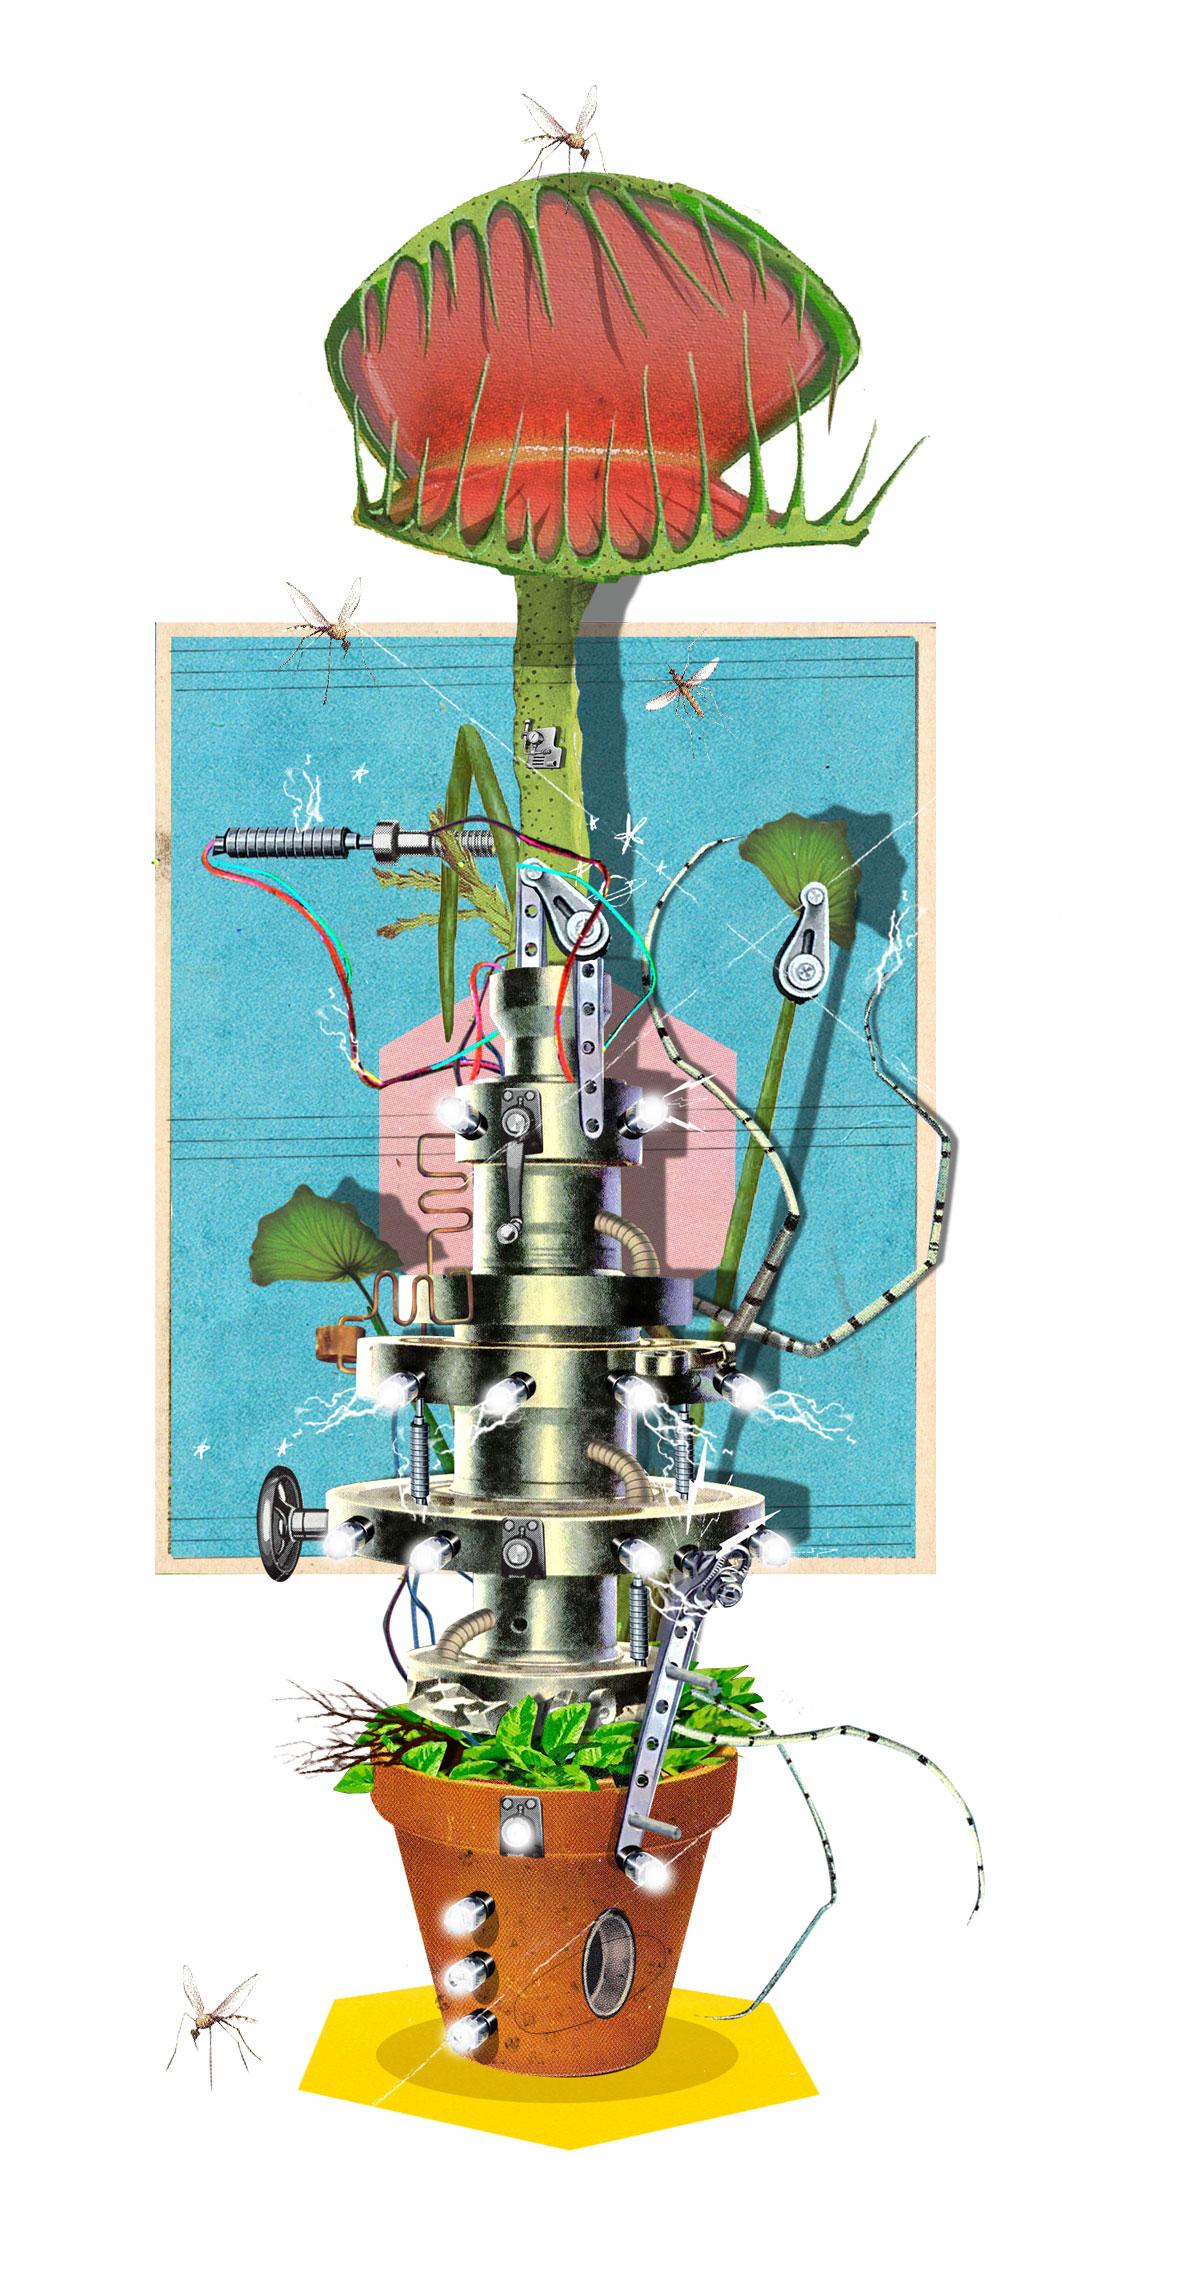 Biorobotics: a Venus Flytrap for Remote Control | Make: on